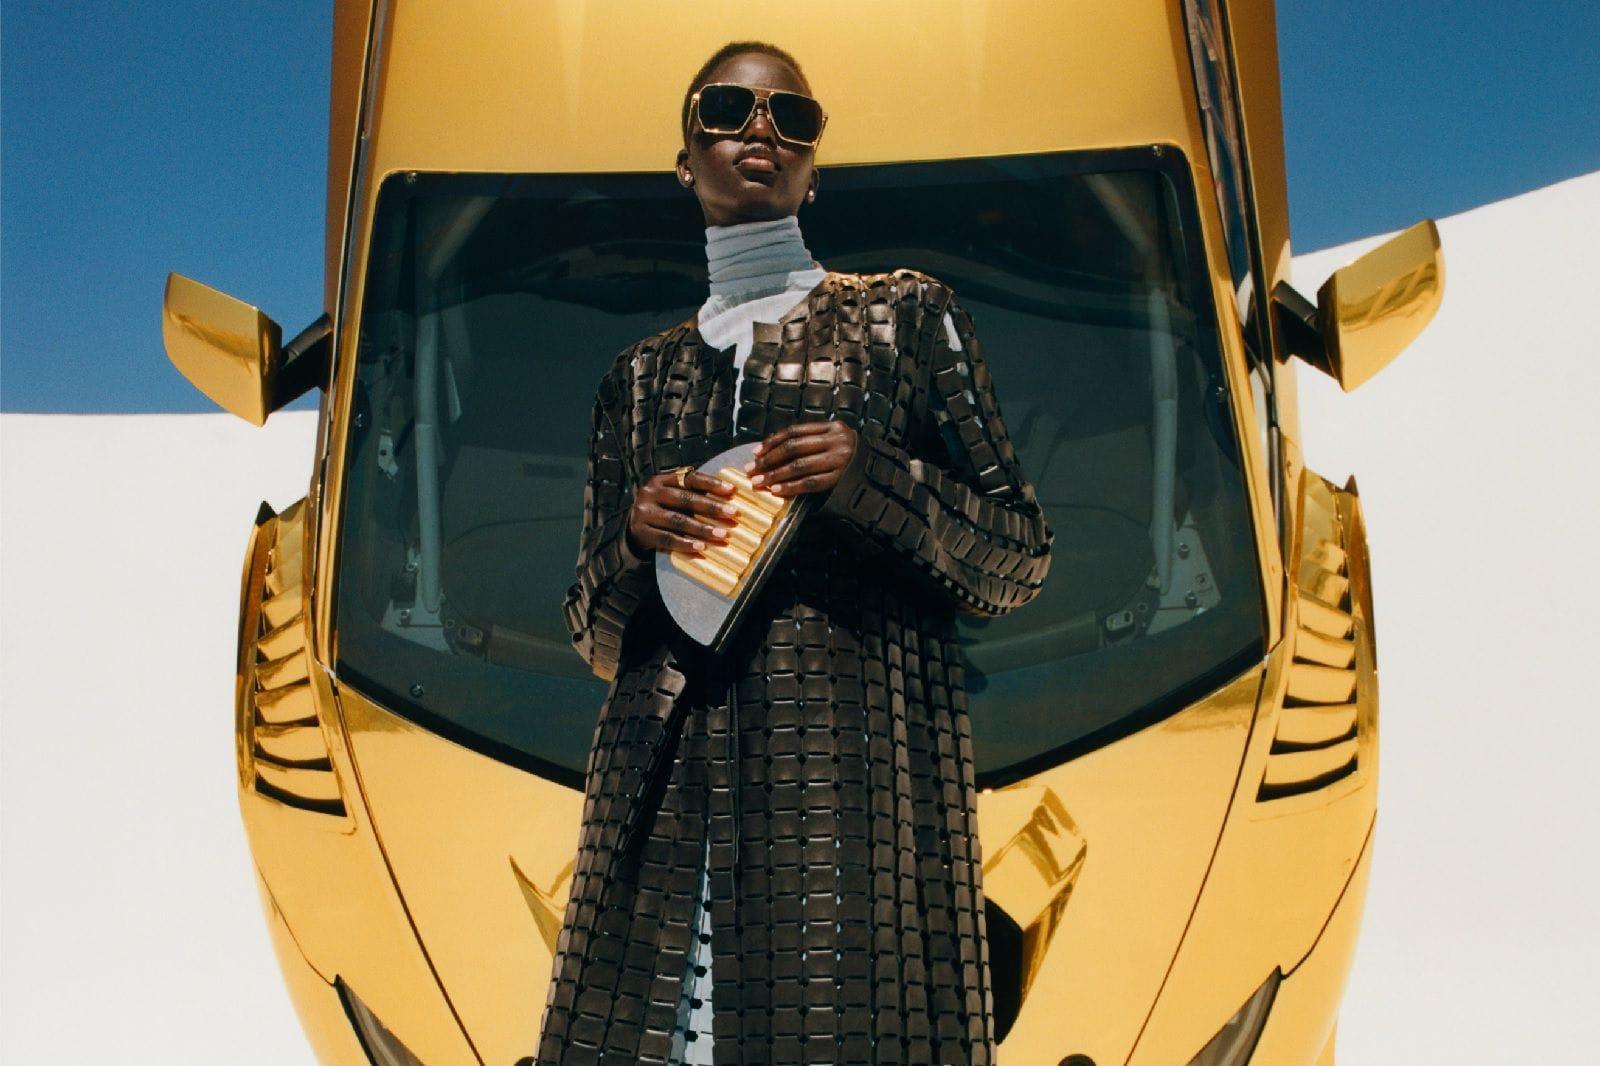 Bottega Veneta Subverts the Idea of Luxury - photographer Tyrone Lebon - Fall 2019 campaign